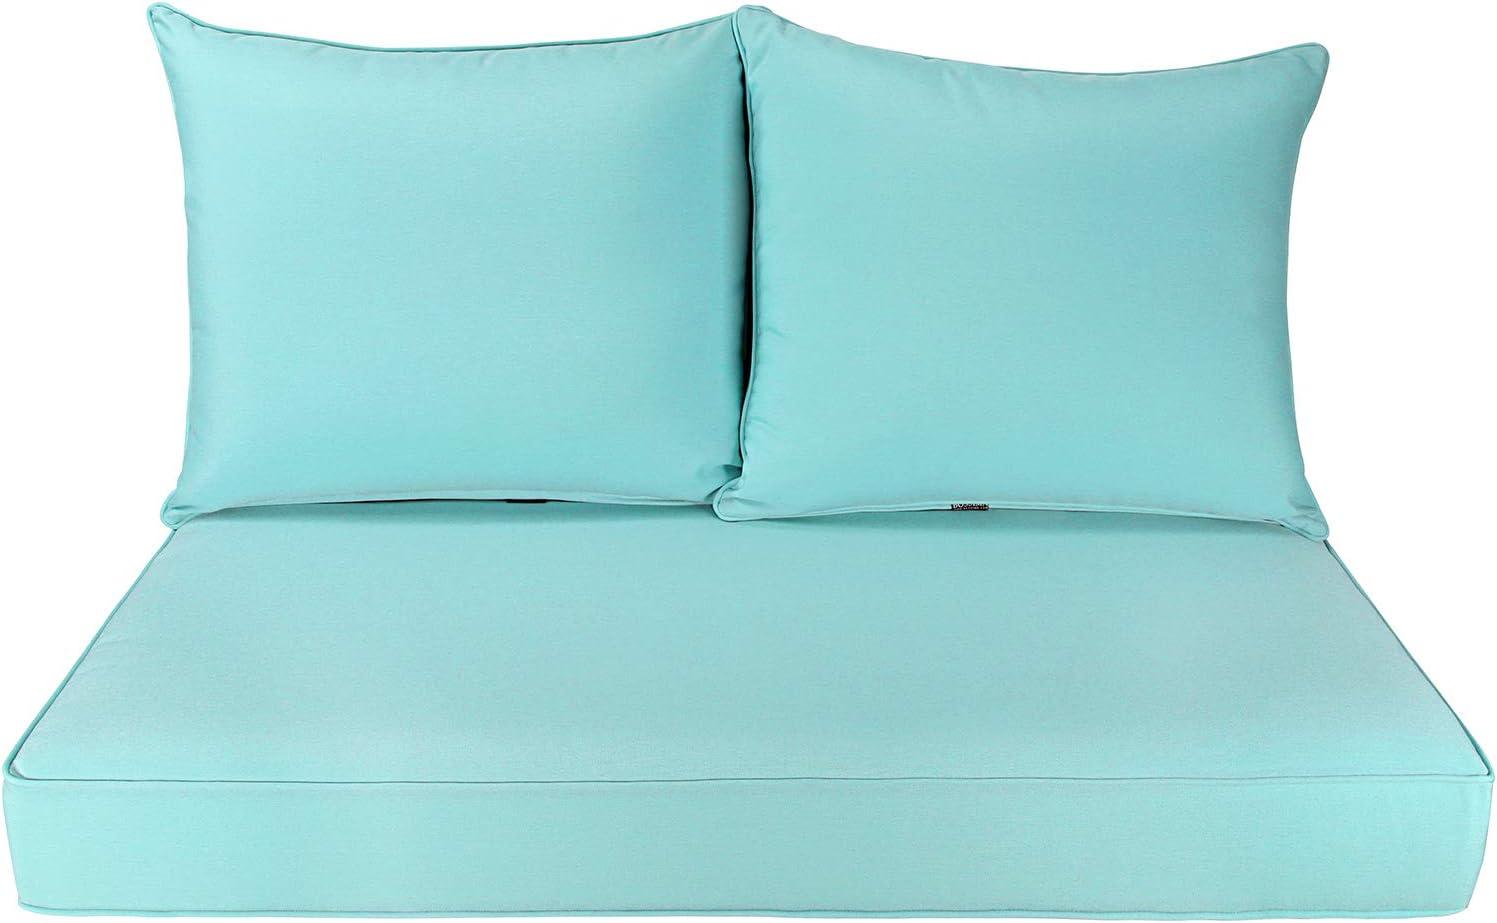 BOSSIMA Patio Furniture Cushions Comofort Deep Seat Loveseat Cushion Indoor Outdoor Seating Cushions Light Blue